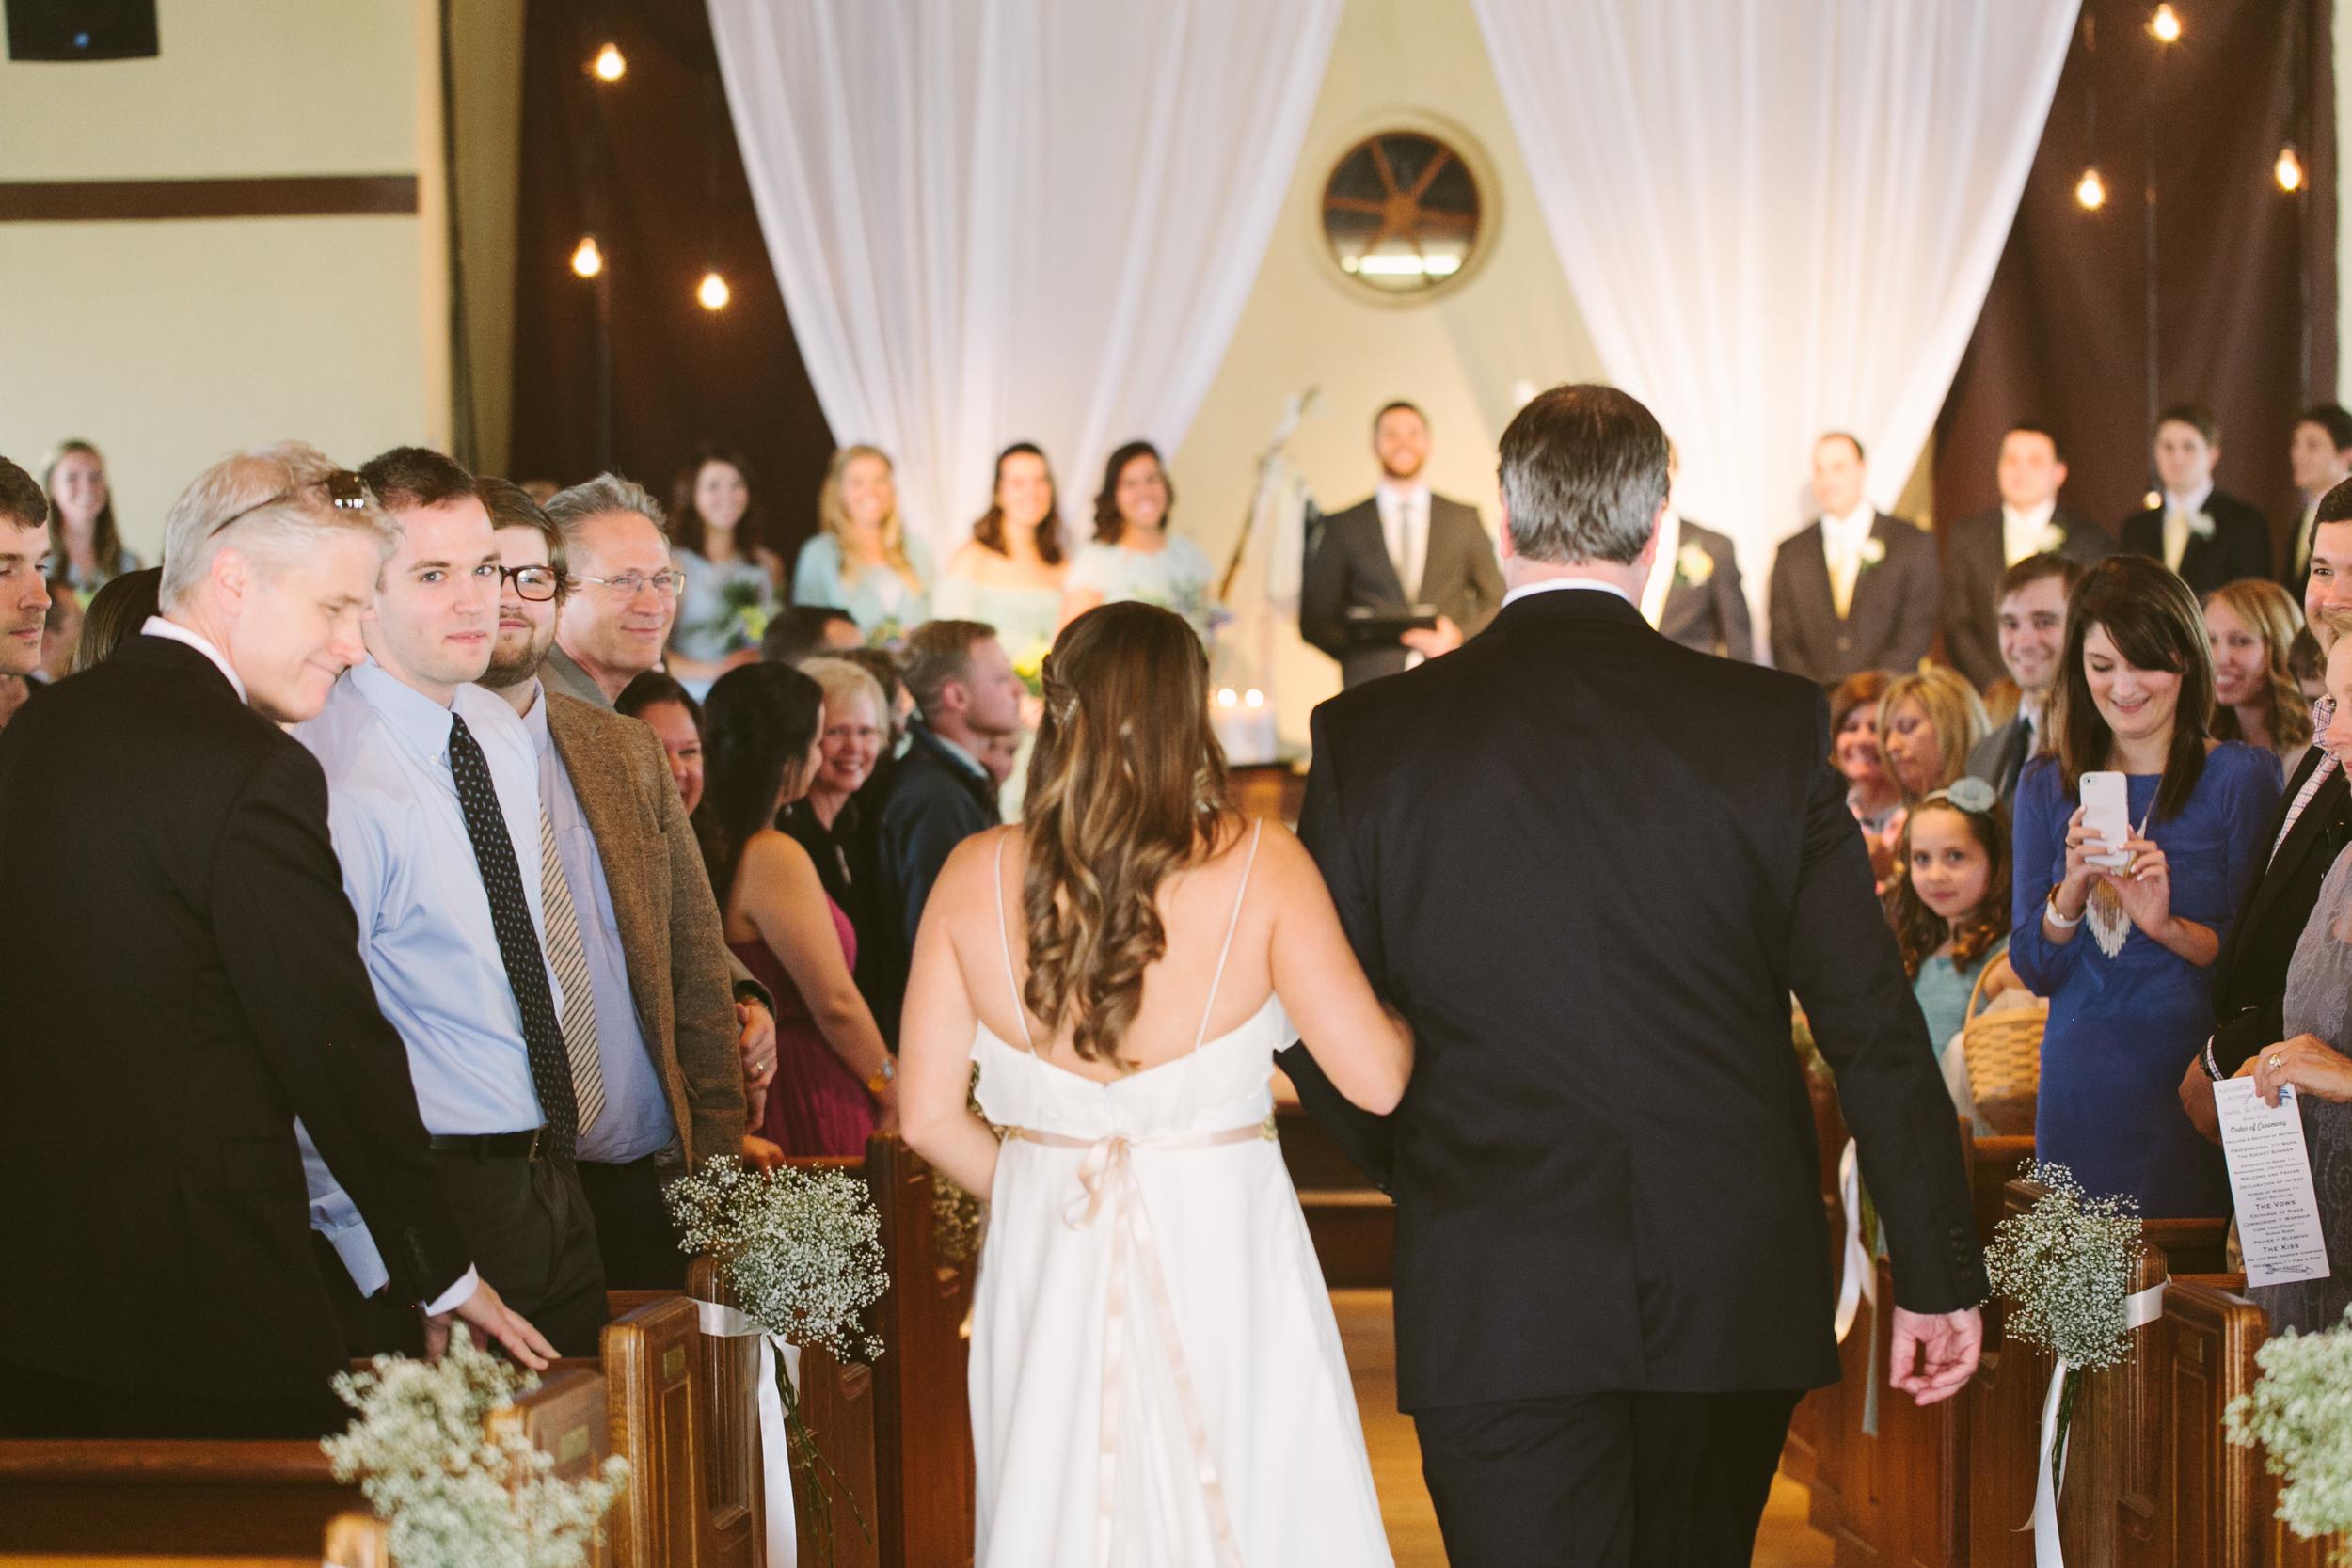 Kathryn-McCrary-Photography-Atlanta-Wedding-Photographer-25.jpg